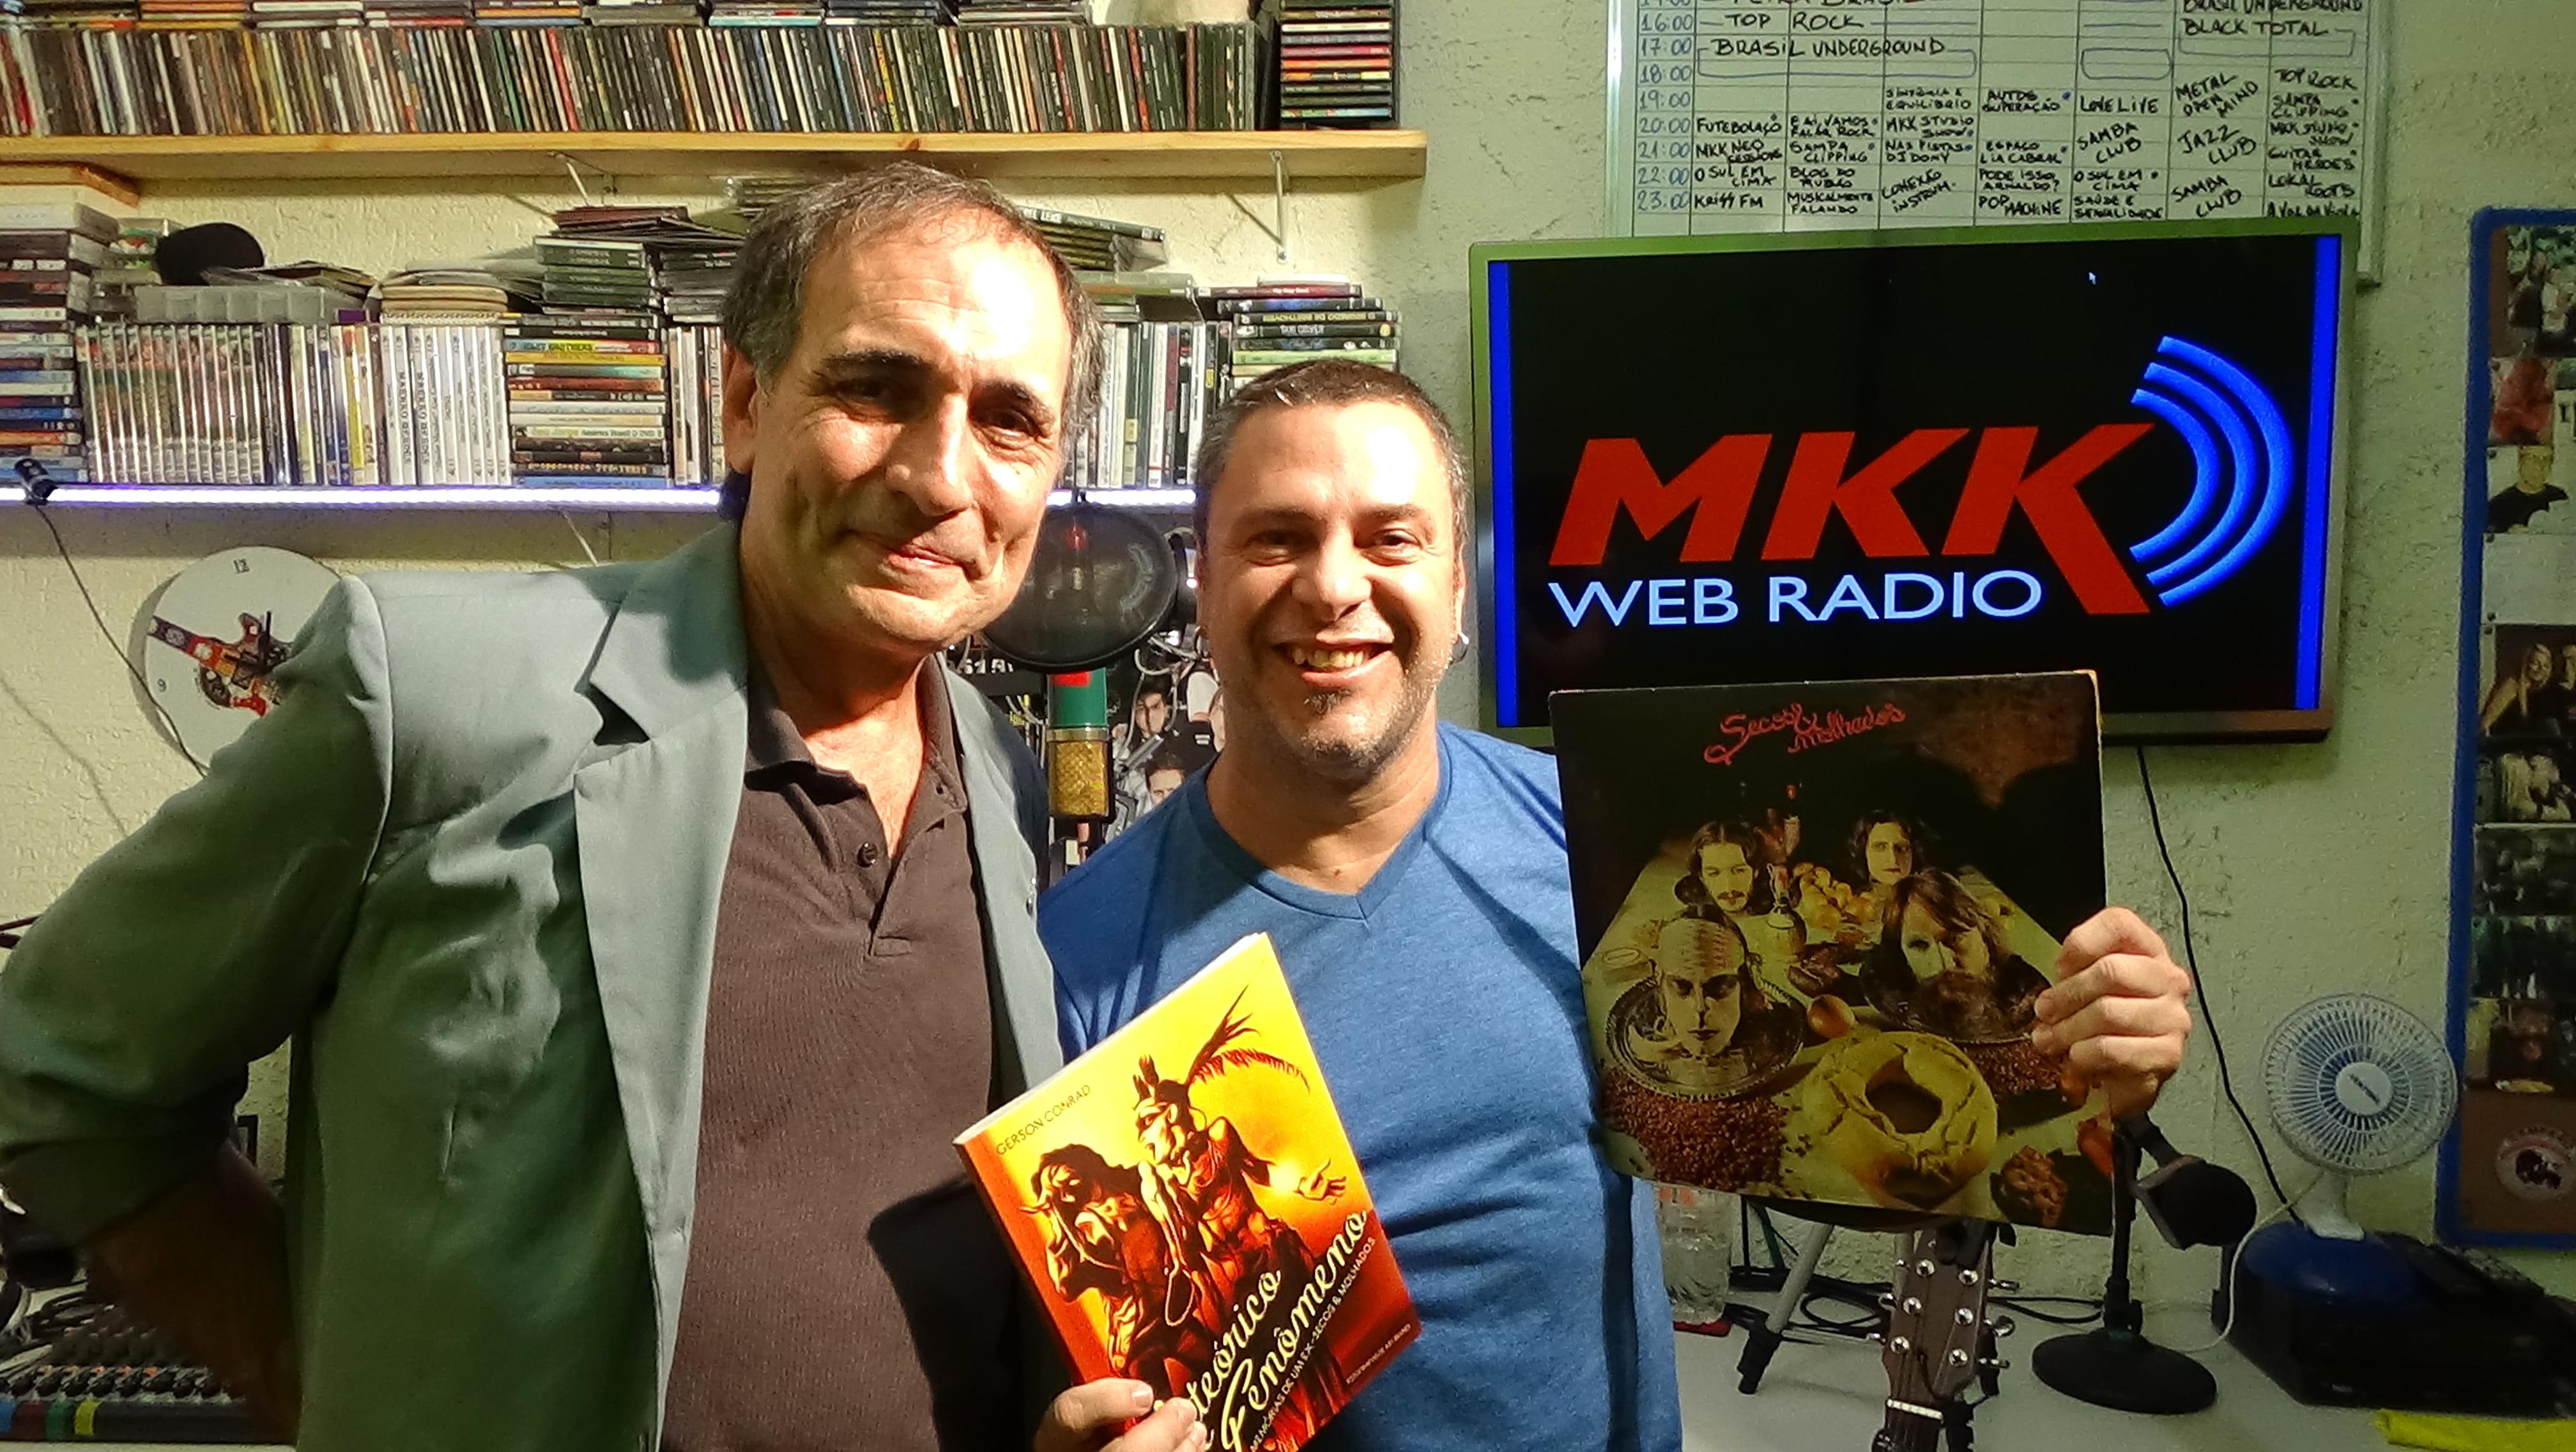 Markko Mendes e Gerson Conrad